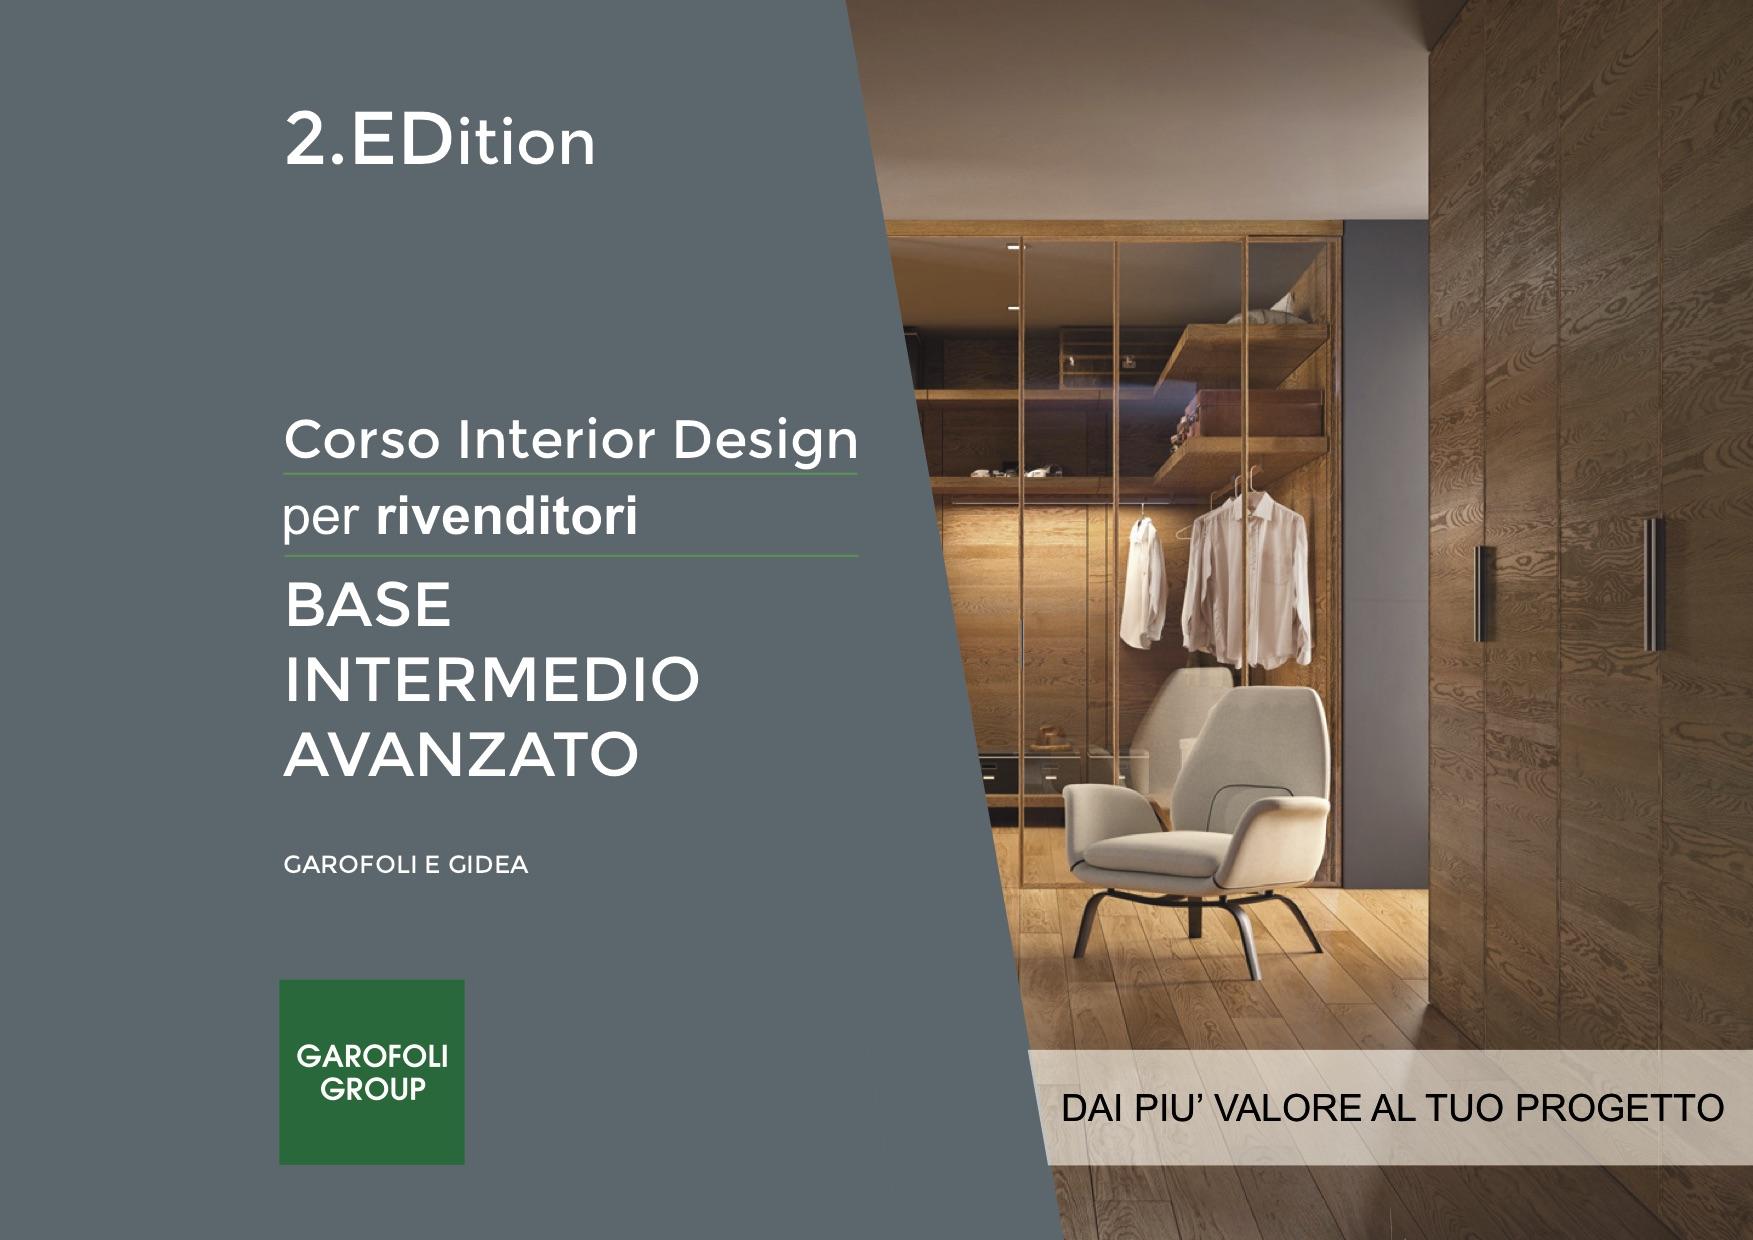 Garofoli Academy Corso Interior Design - Garofoli